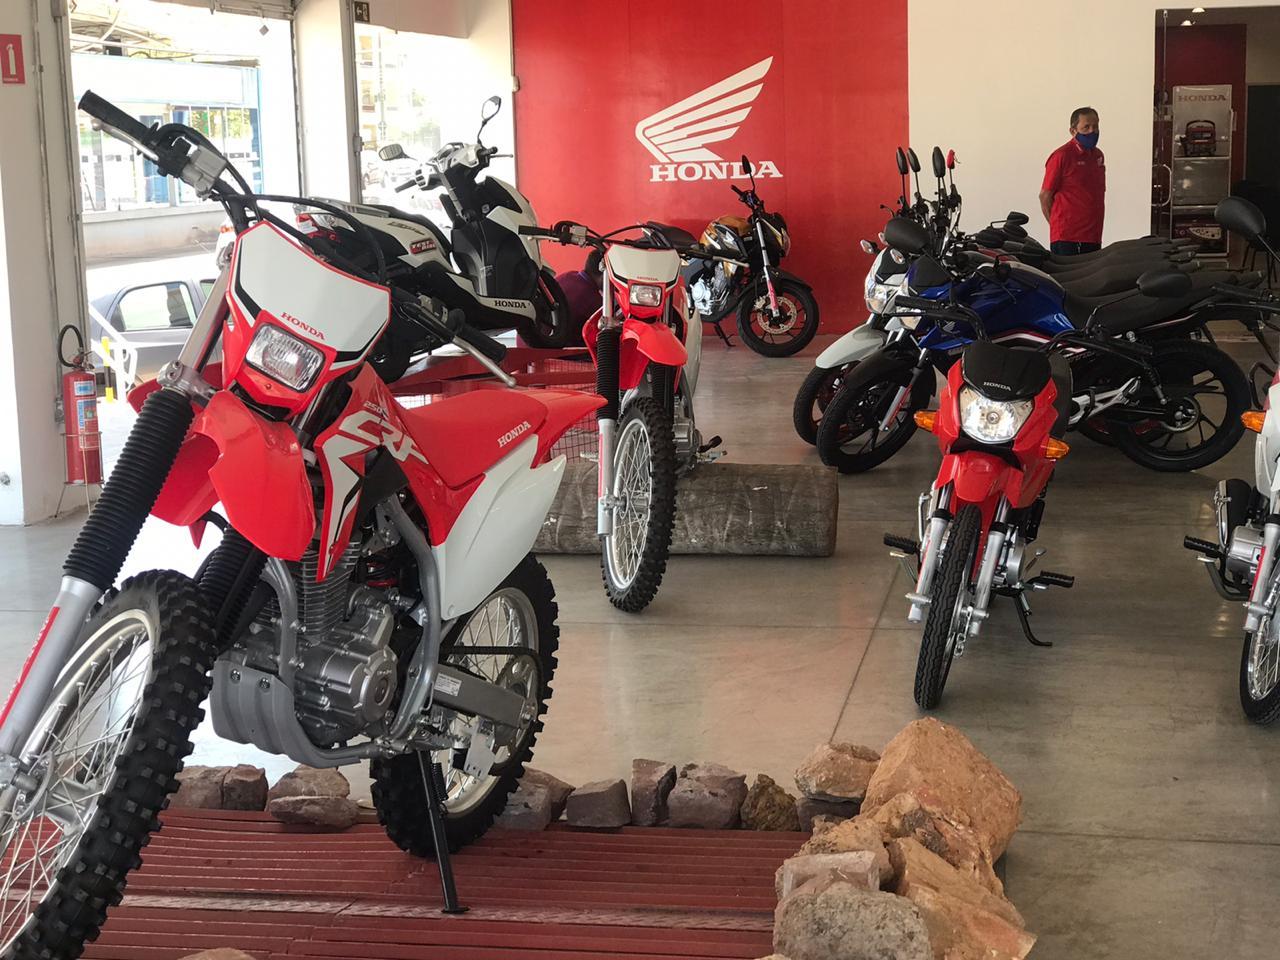 Dia especial de vendas na Japan Motos / Crédito: Waldelúcio Barbosa